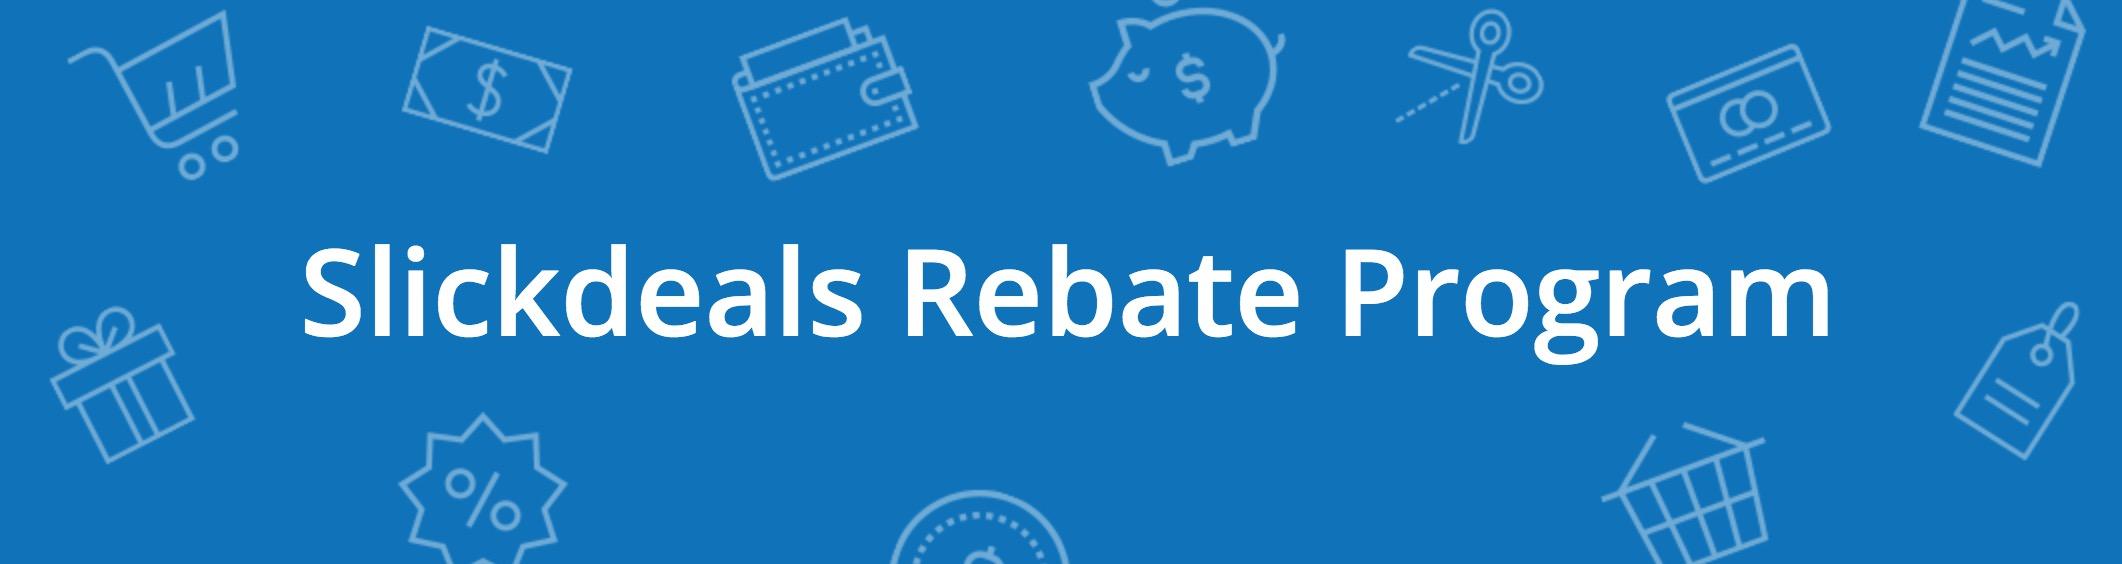 Slickdeals Macy's Rebate